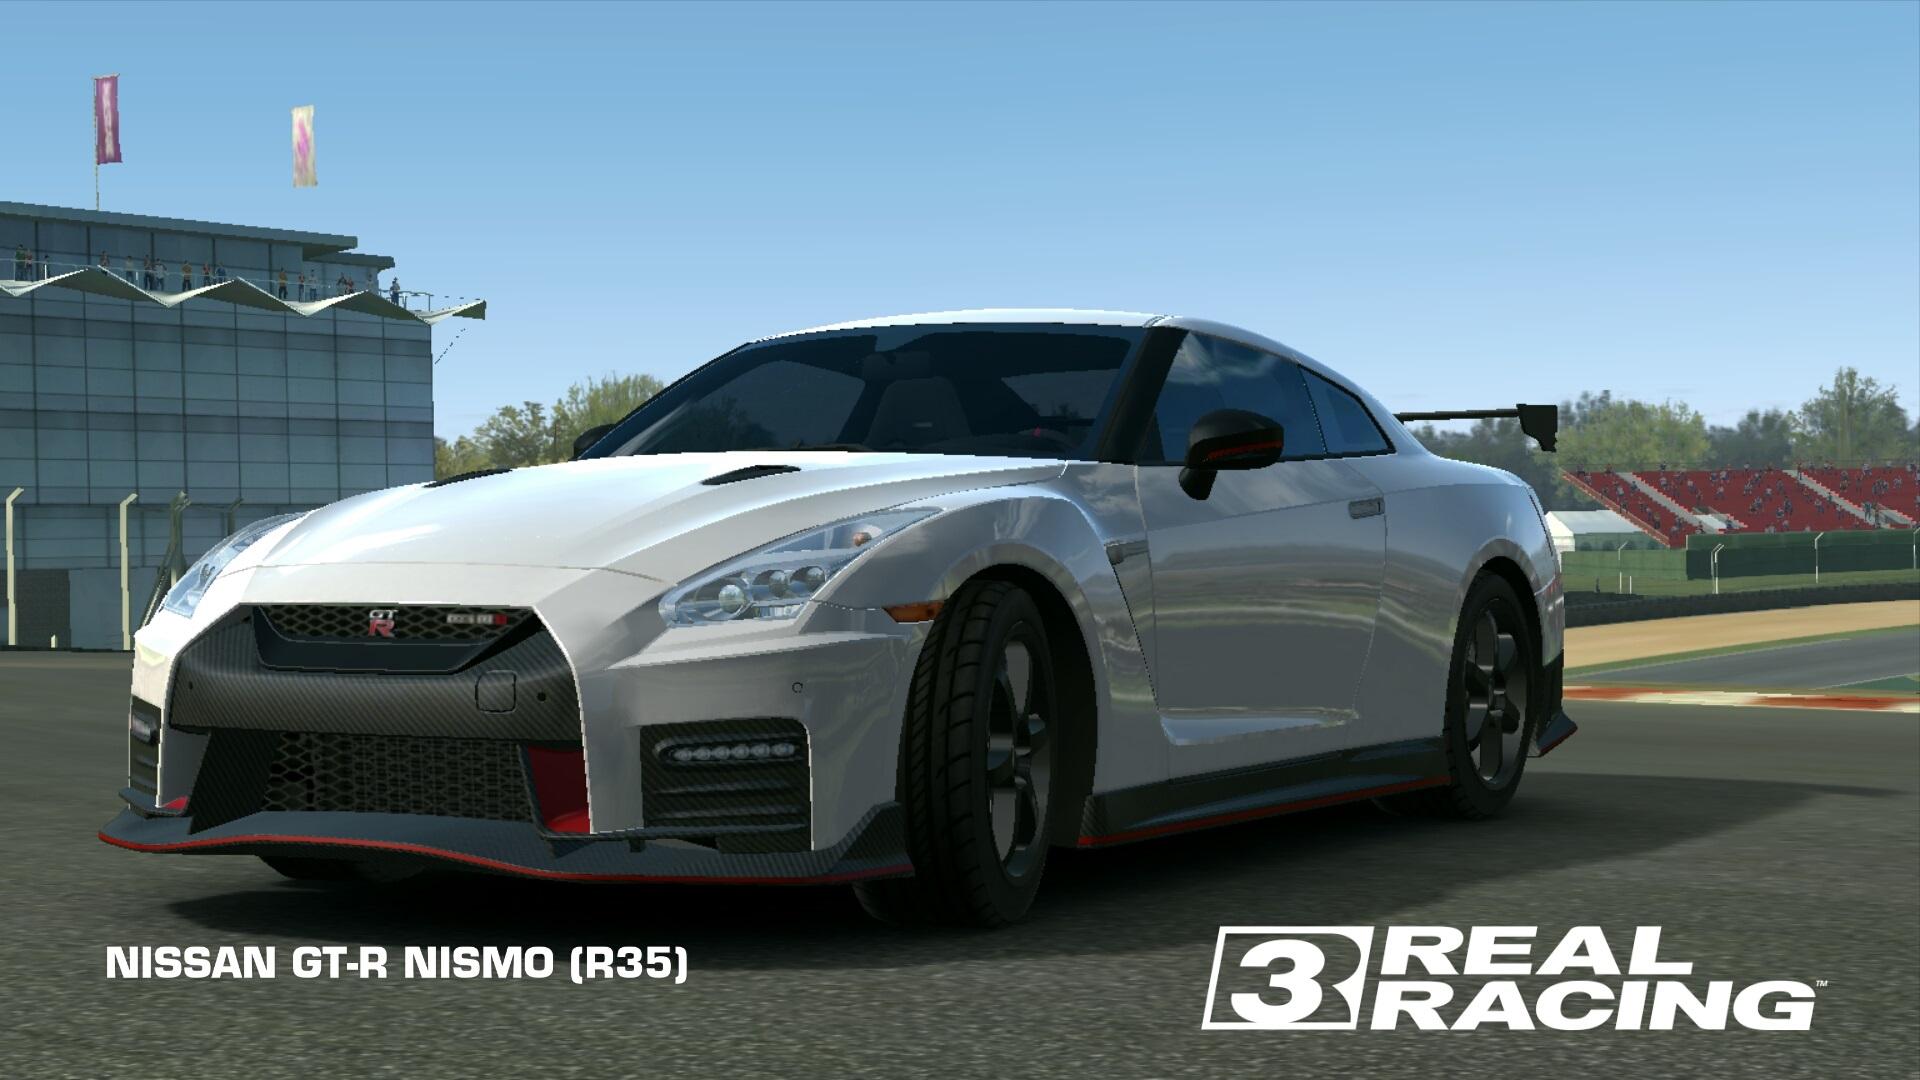 Nissan Gt R Nismo R35 Real Racing 3 Wiki Fandom Powered By Wikia